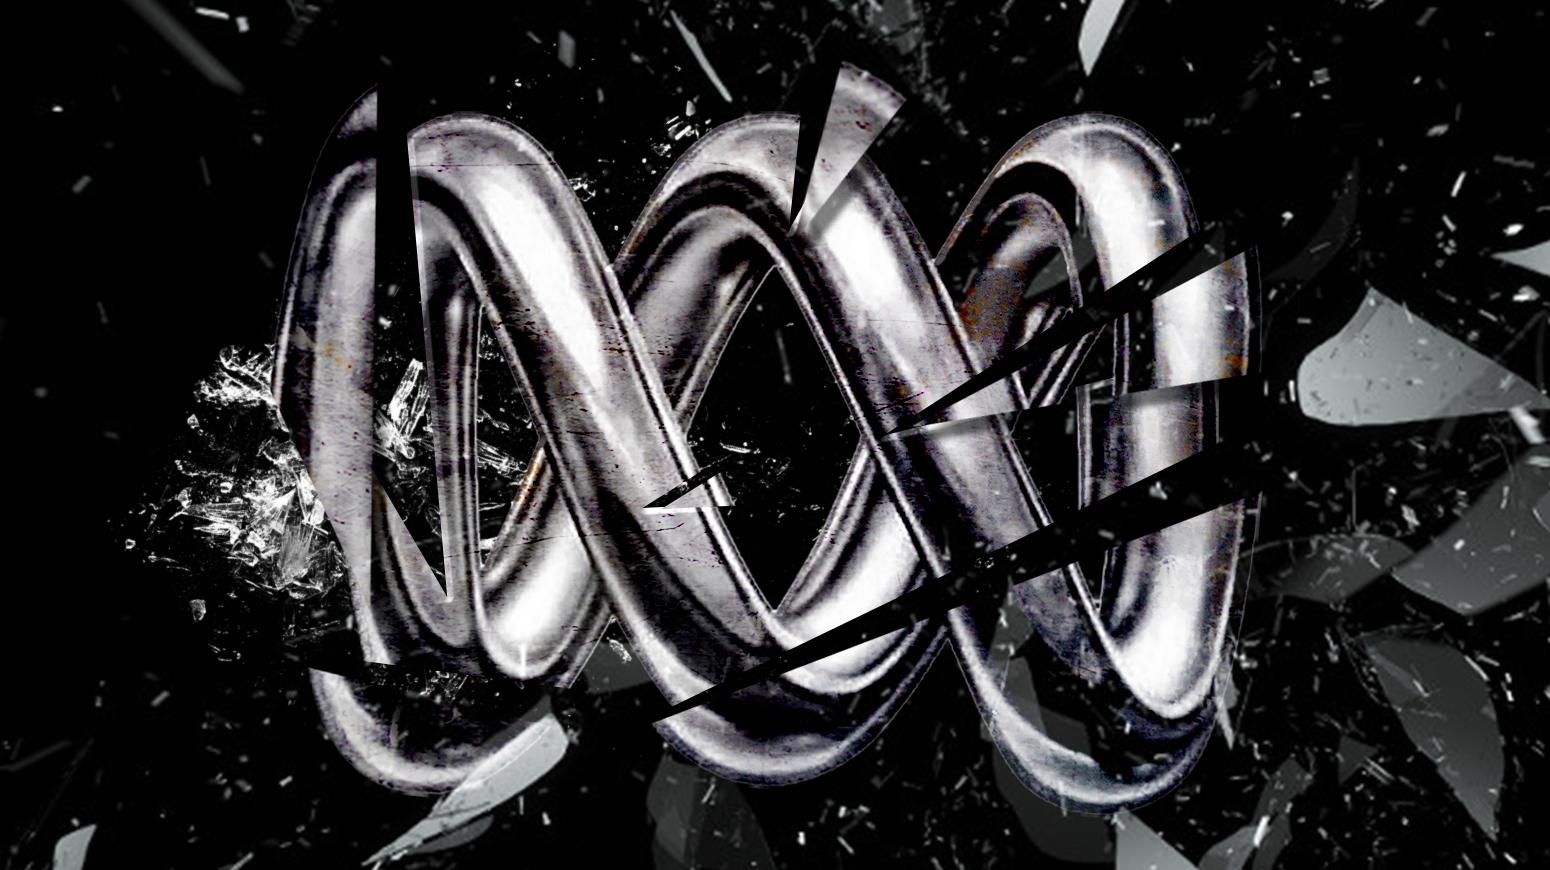 A smashed ABC logo on a black background